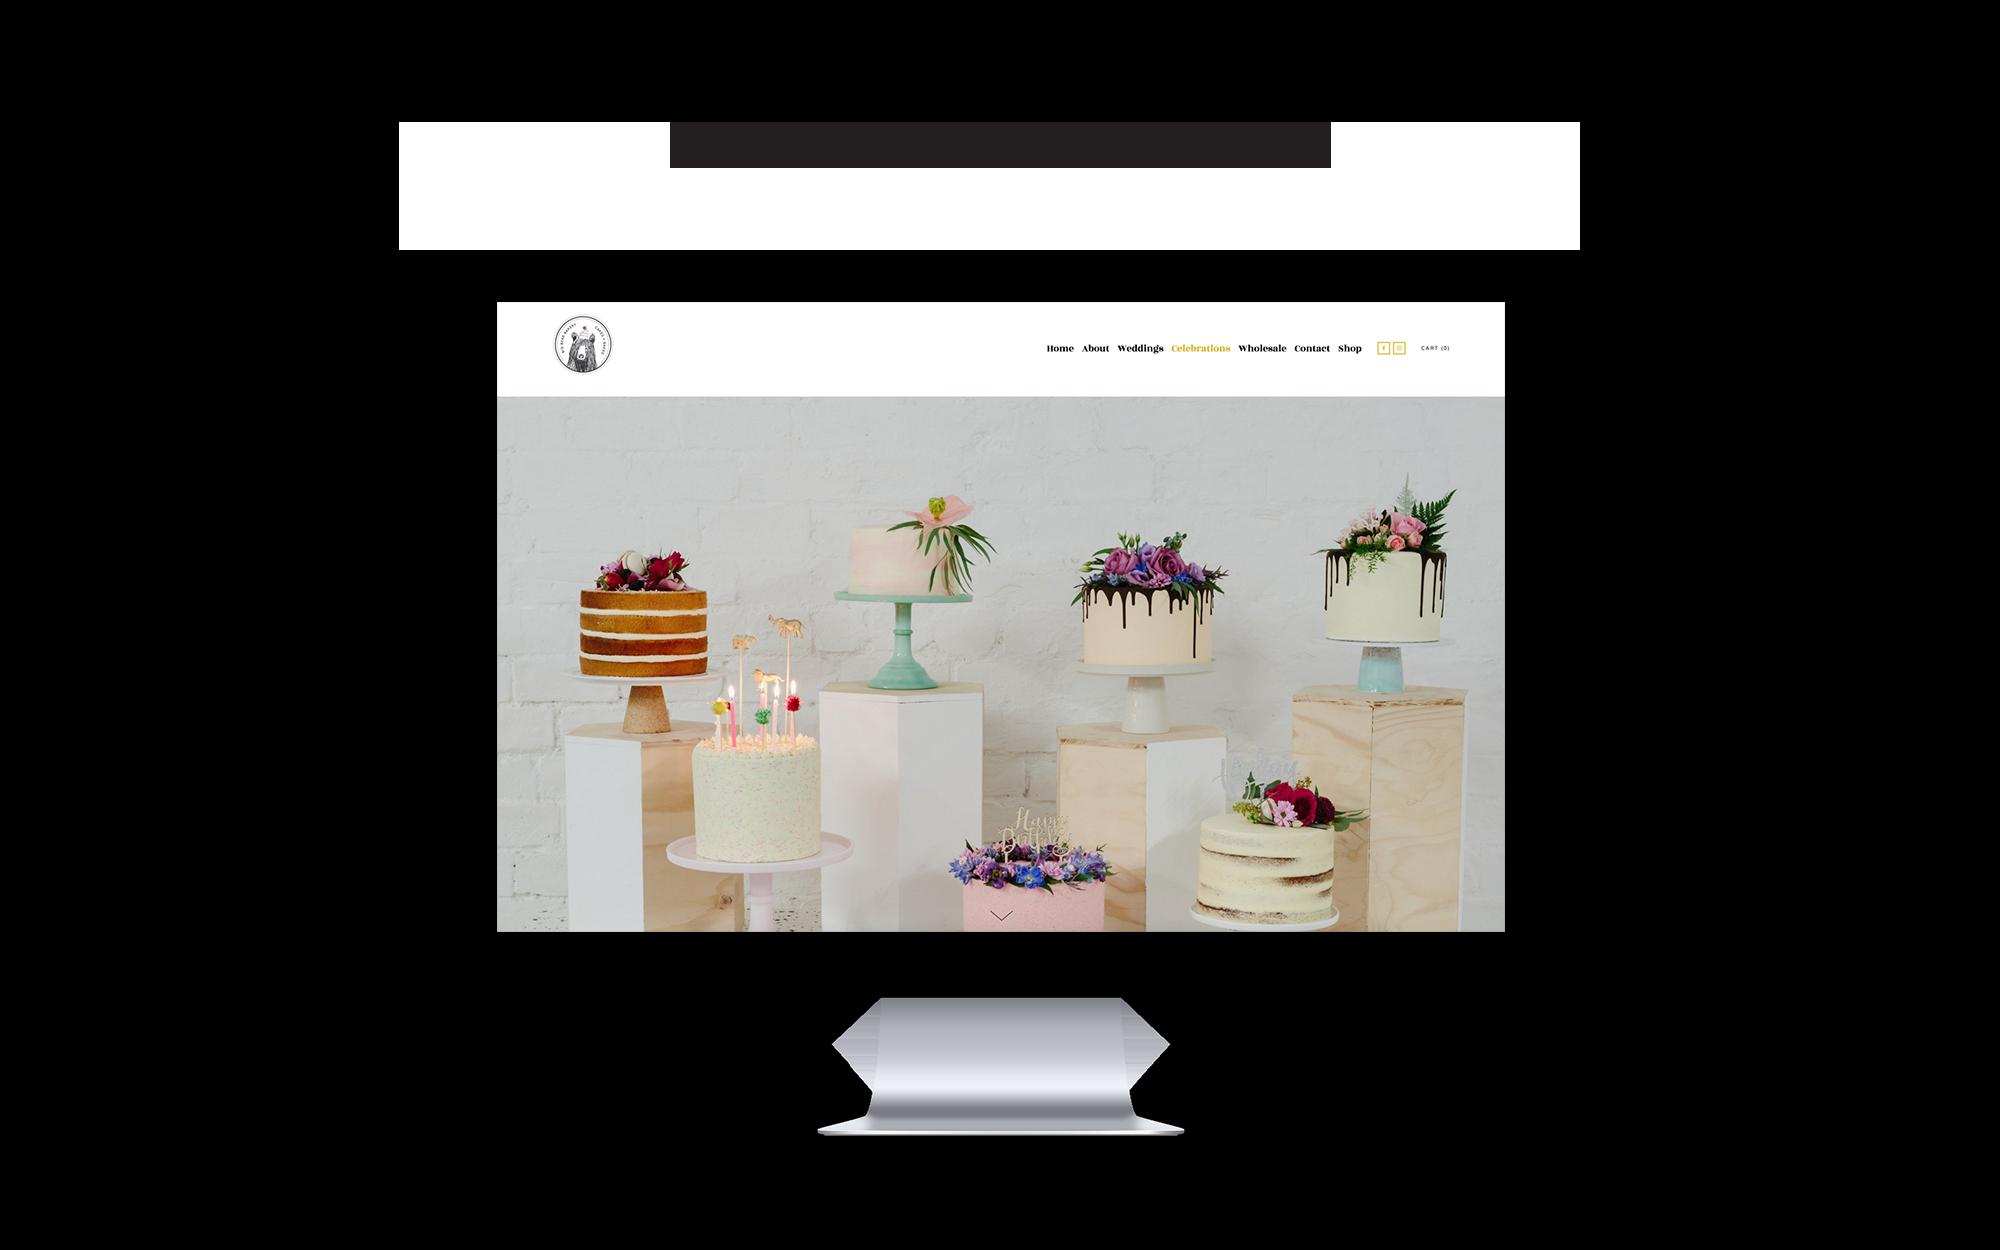 website-design-responsive-glasgow-big-bear-bakery-walnut-wasp.jpg